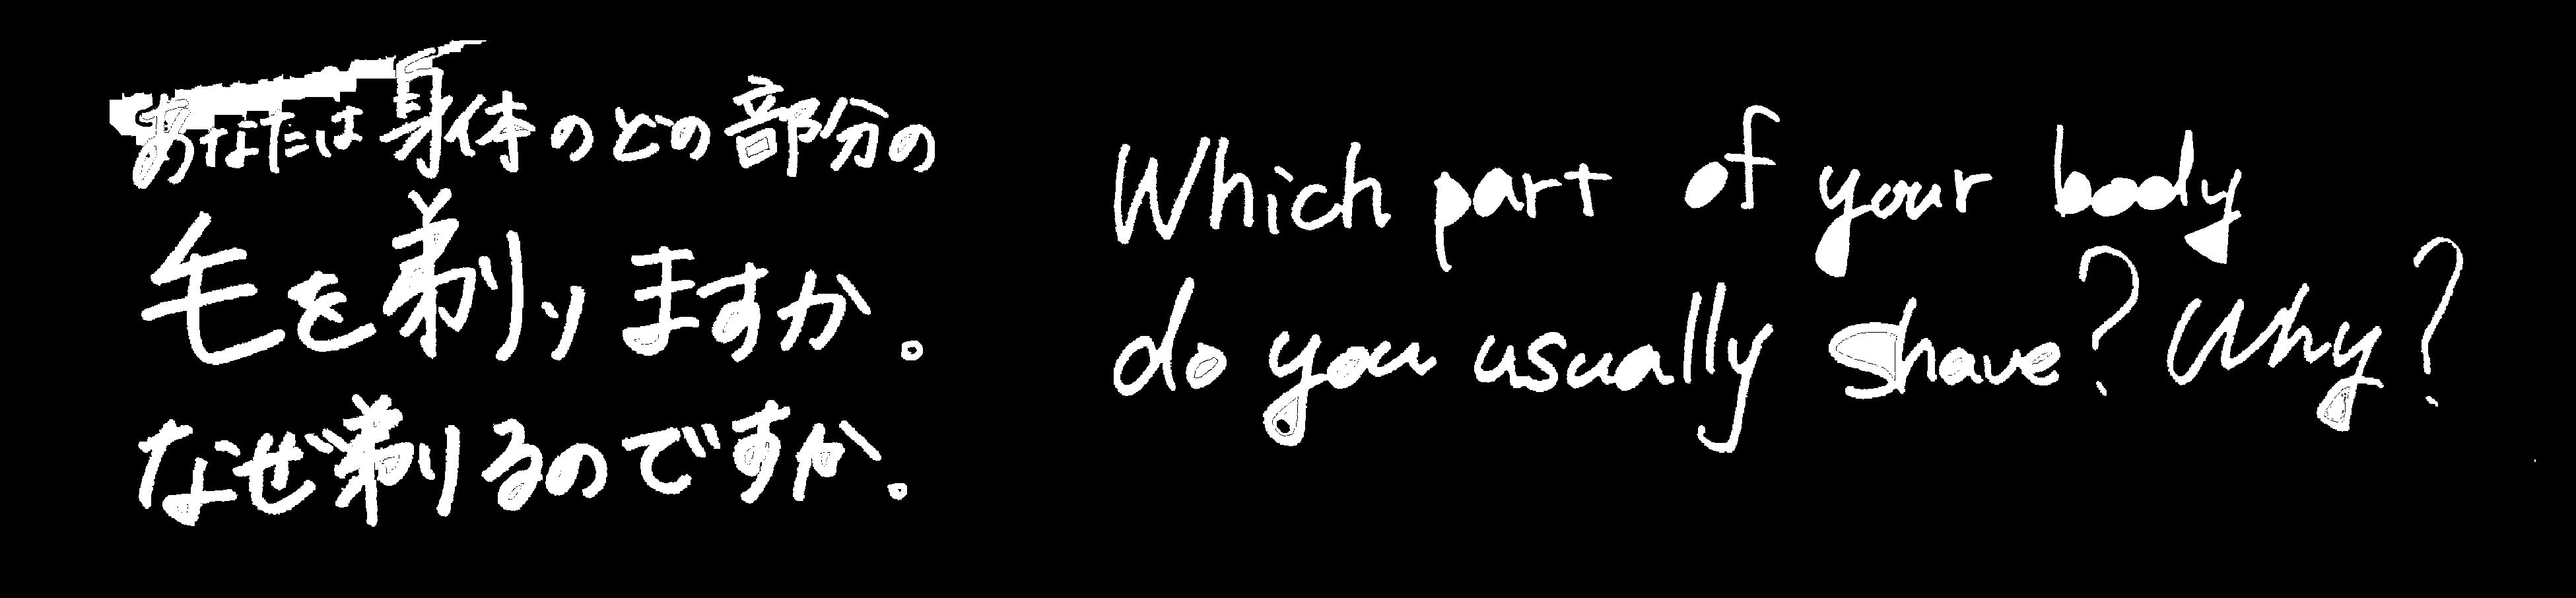 Question13